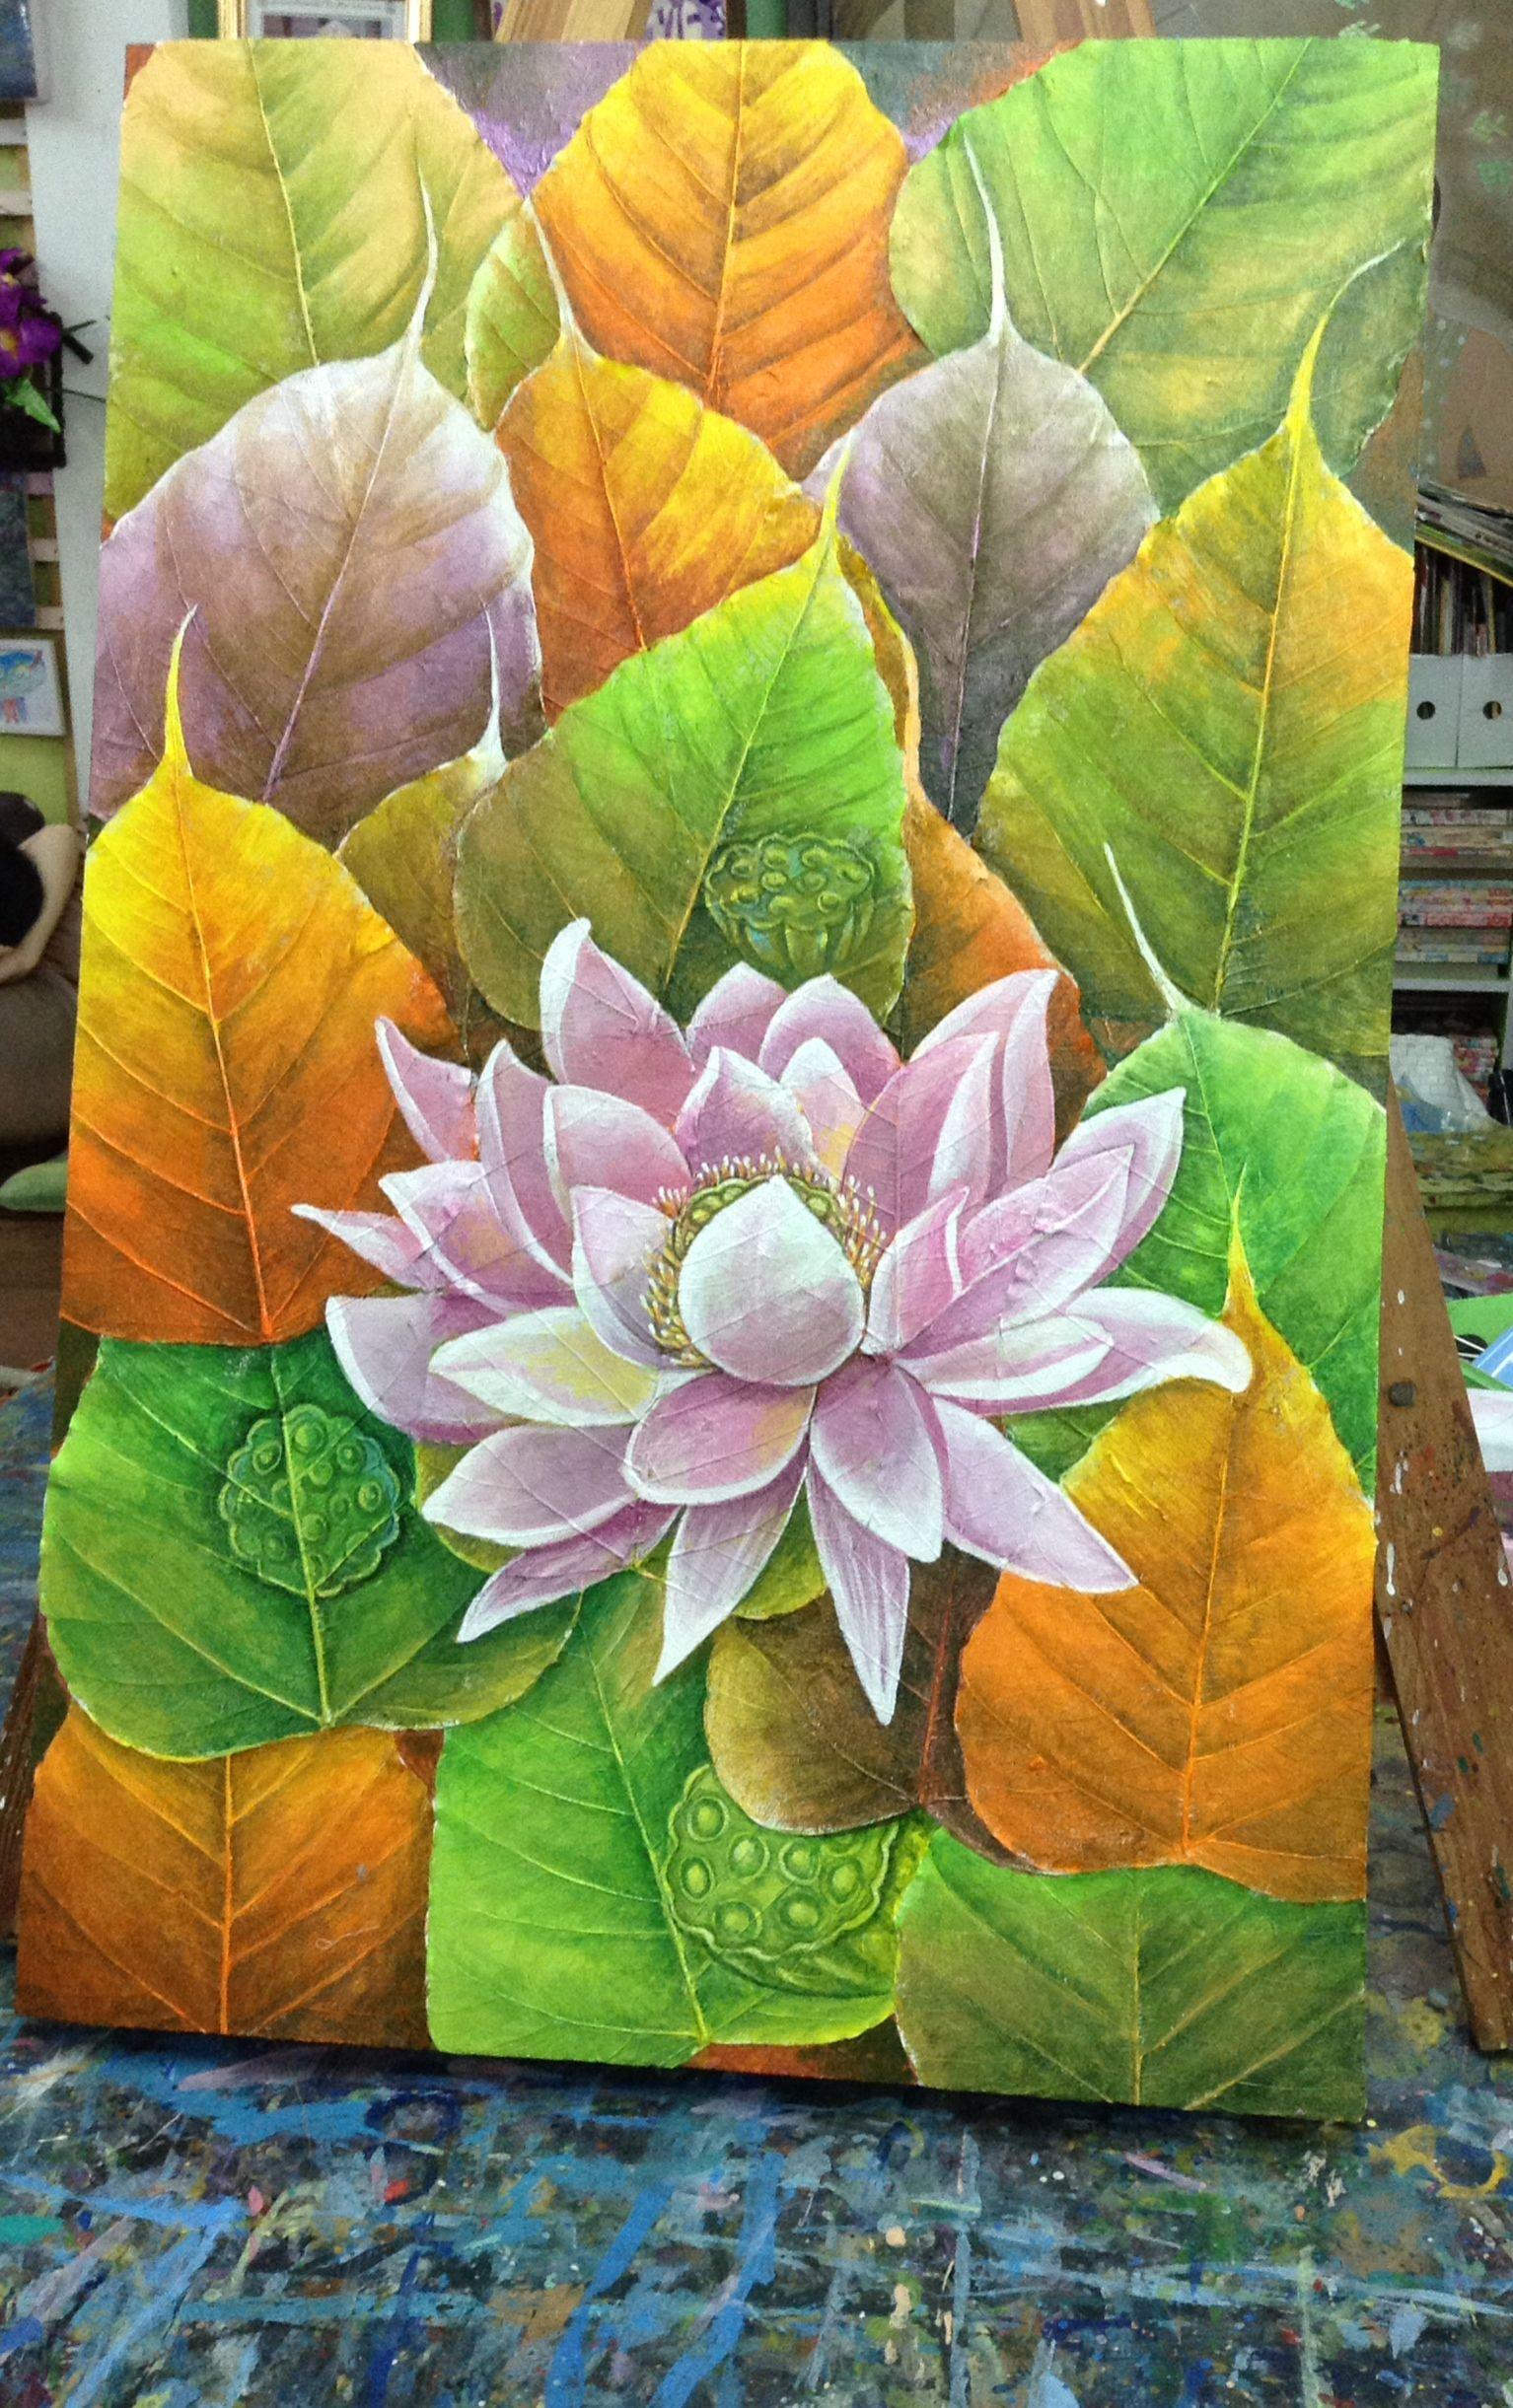 Beautiful decorative acrylic painting lotus flower made with real beautiful decorative acrylic painting lotus flower made with real preserved bodhi leaves size 40x60 cm flower izmirmasajfo